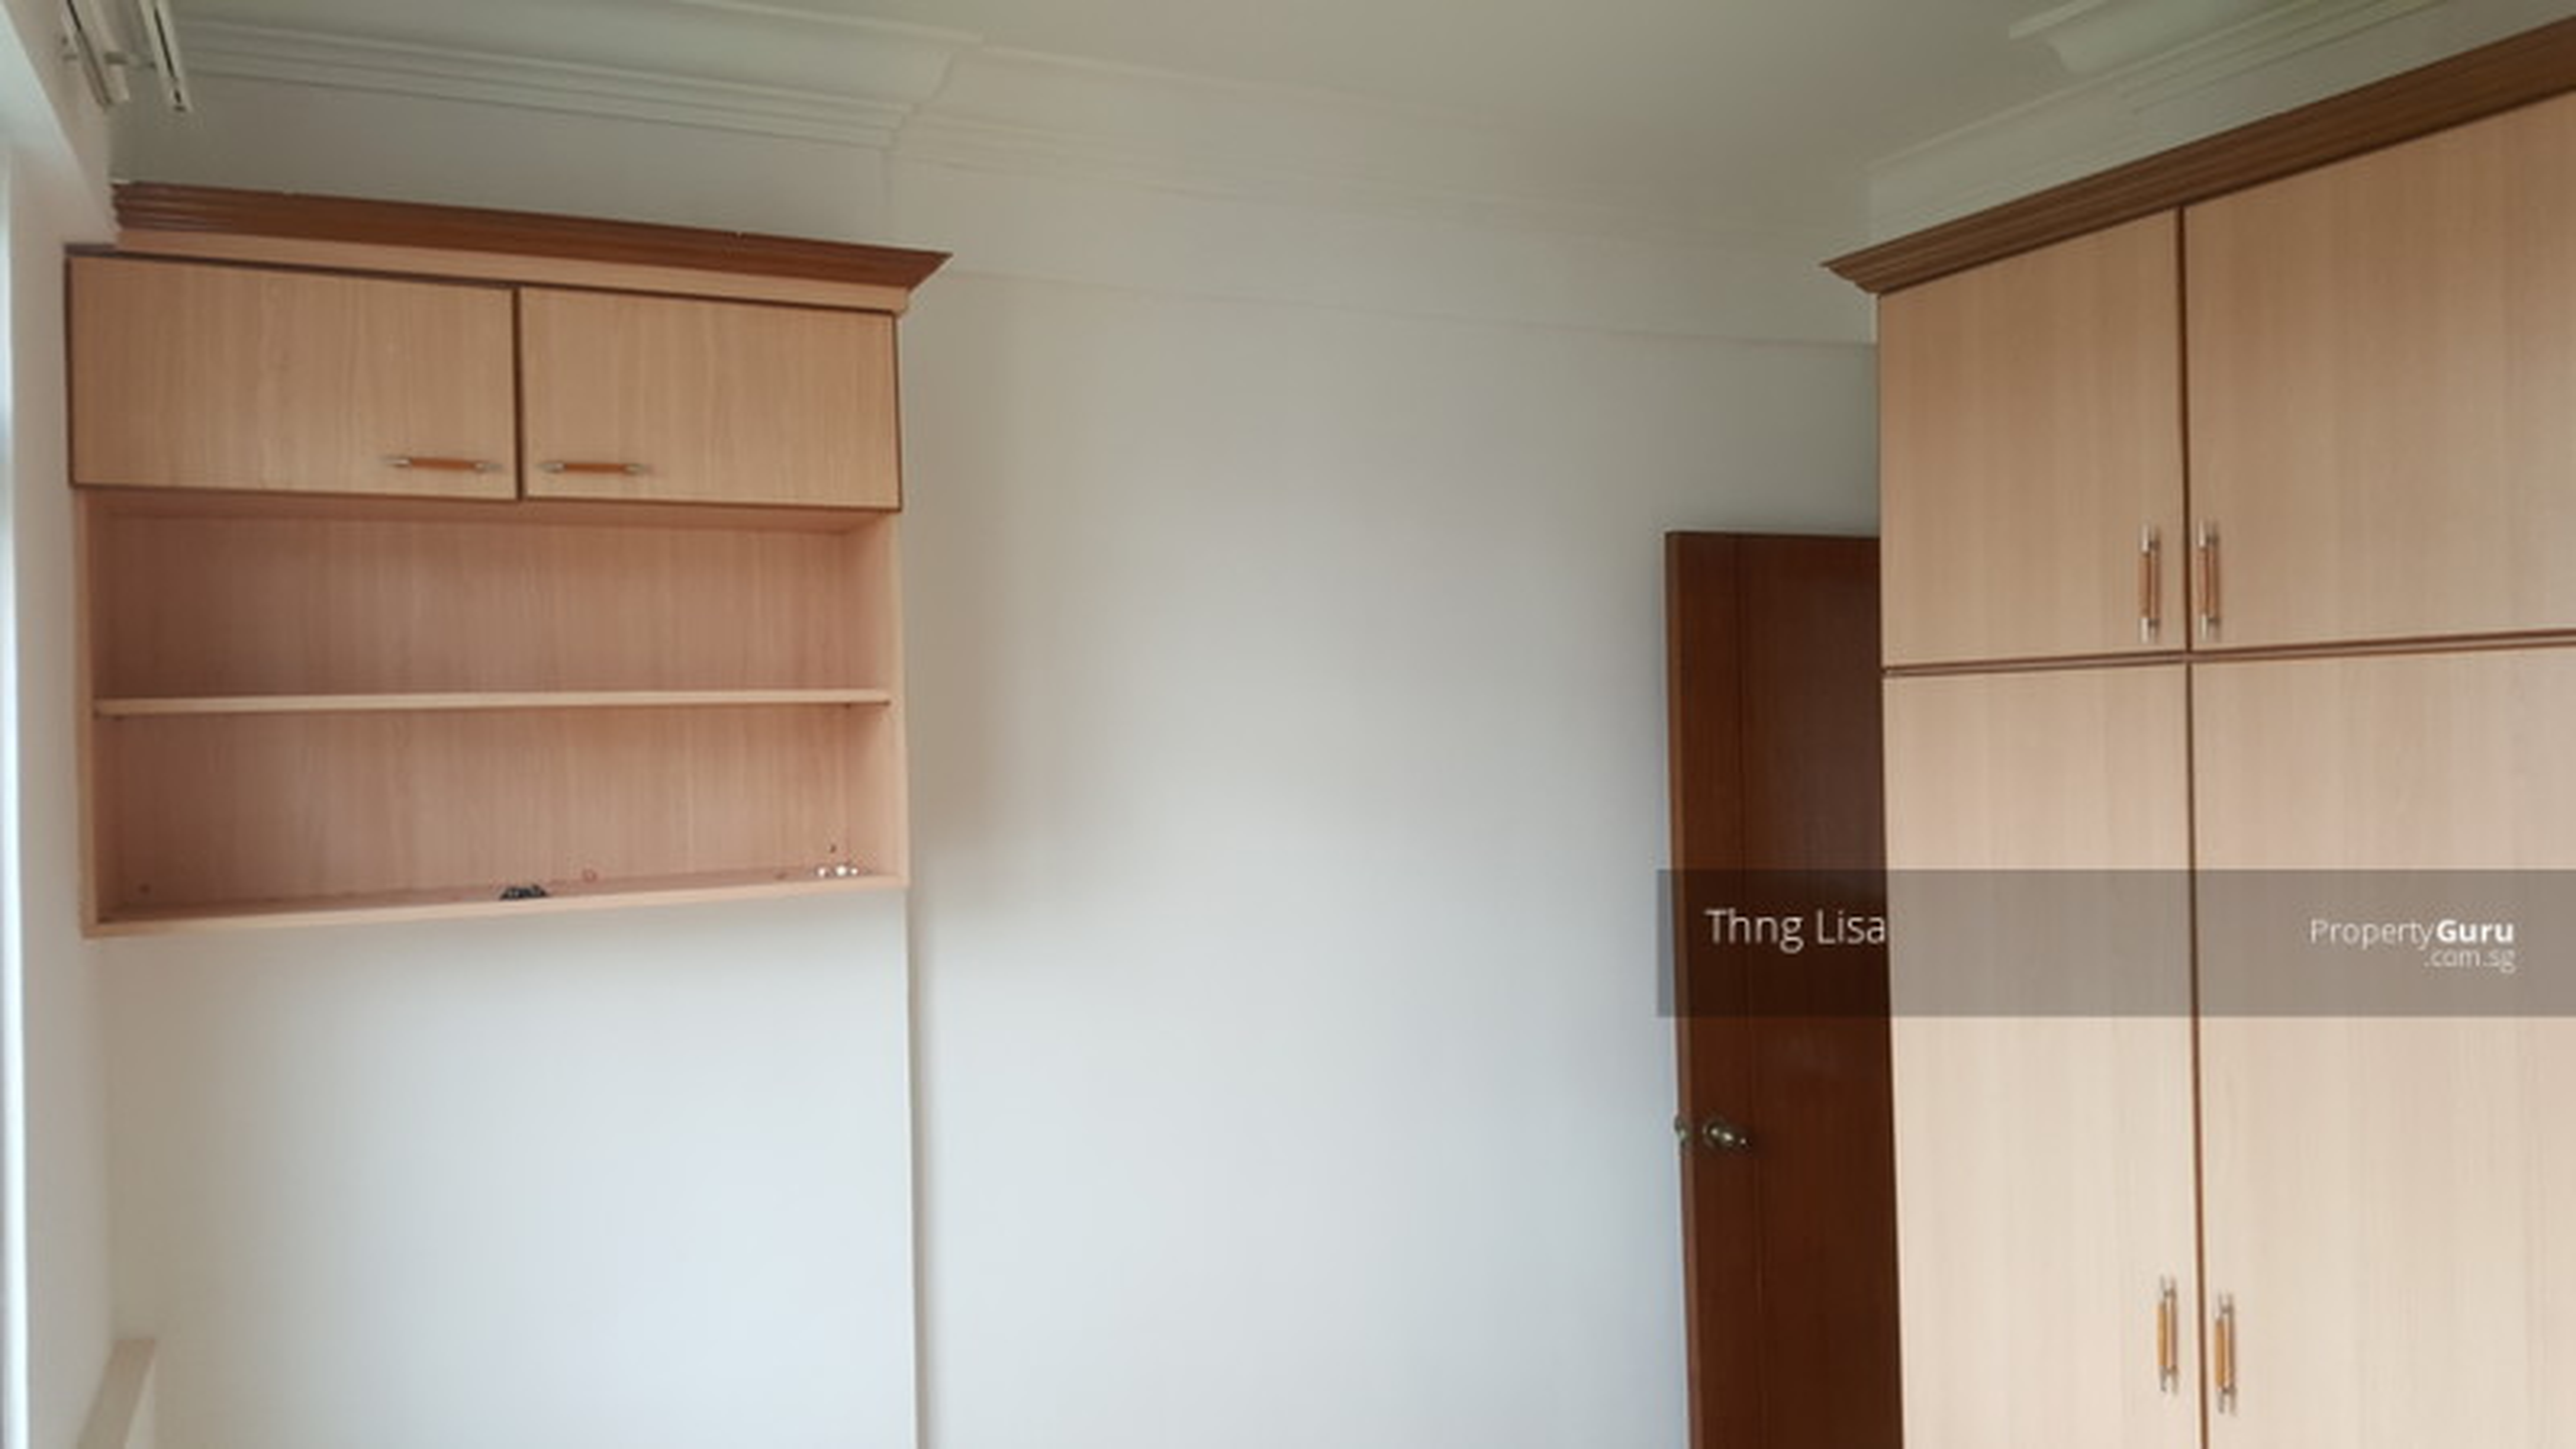 Alot storage spaces